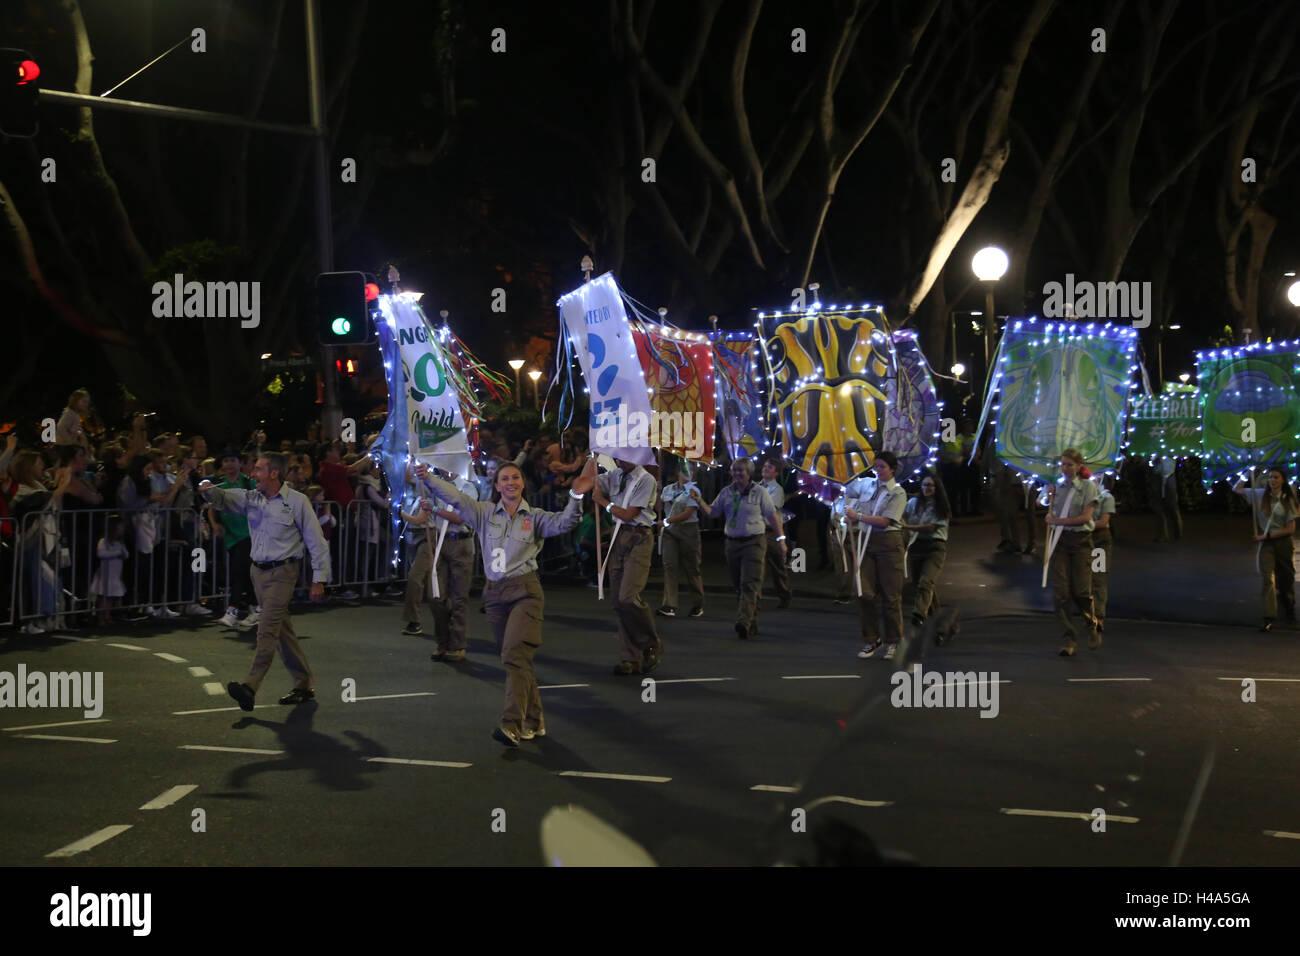 Sydney, Australia. 15 October 2016. The streets of Sydney light up to celebrate Taronga Zoo's centenary year in - Stock Image